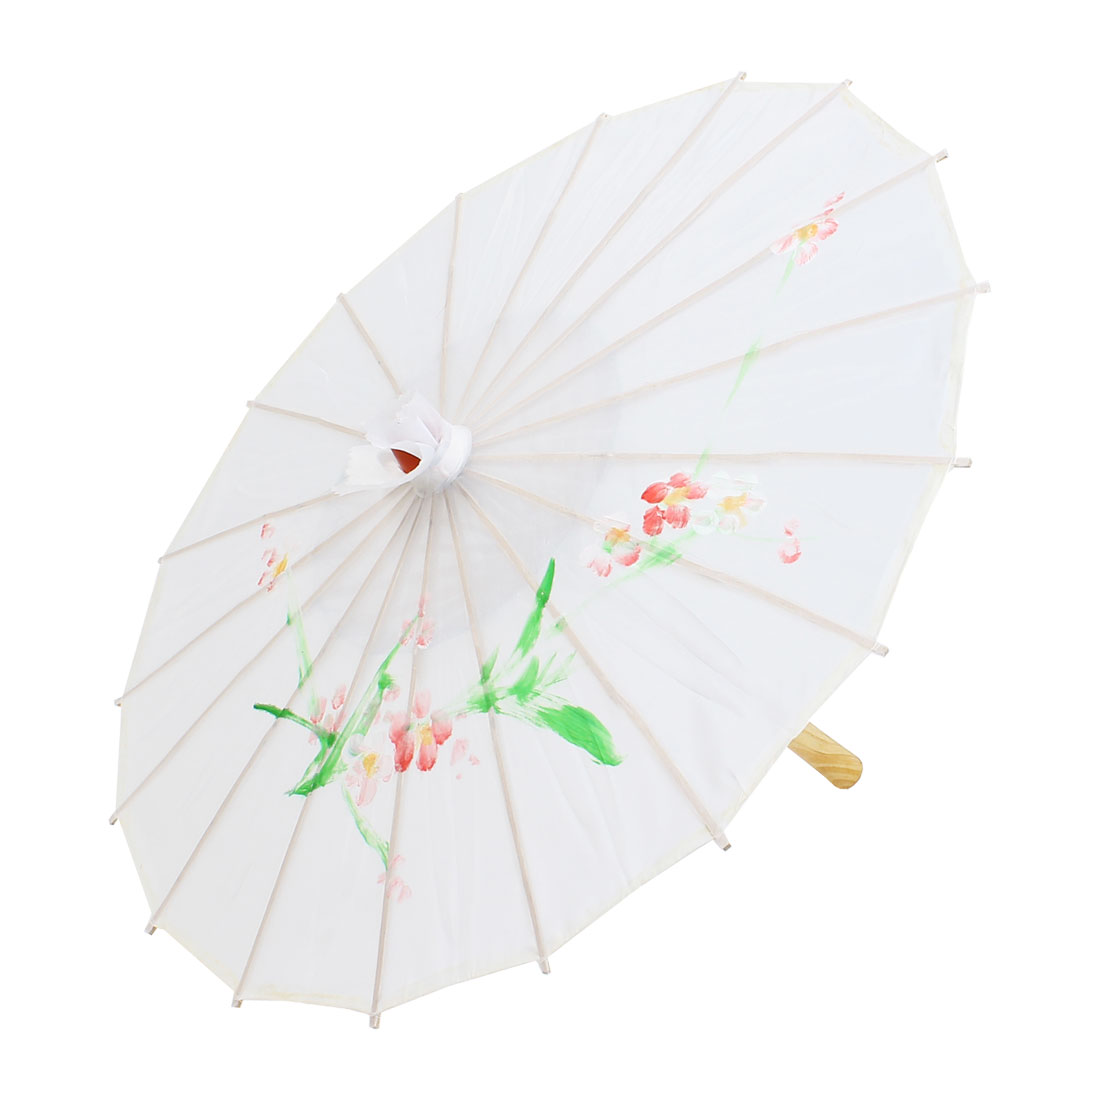 Flower Printed White Polyester Cover Bamboo Rib Folding Parasol Dancing Umbrella - image 4 of 4